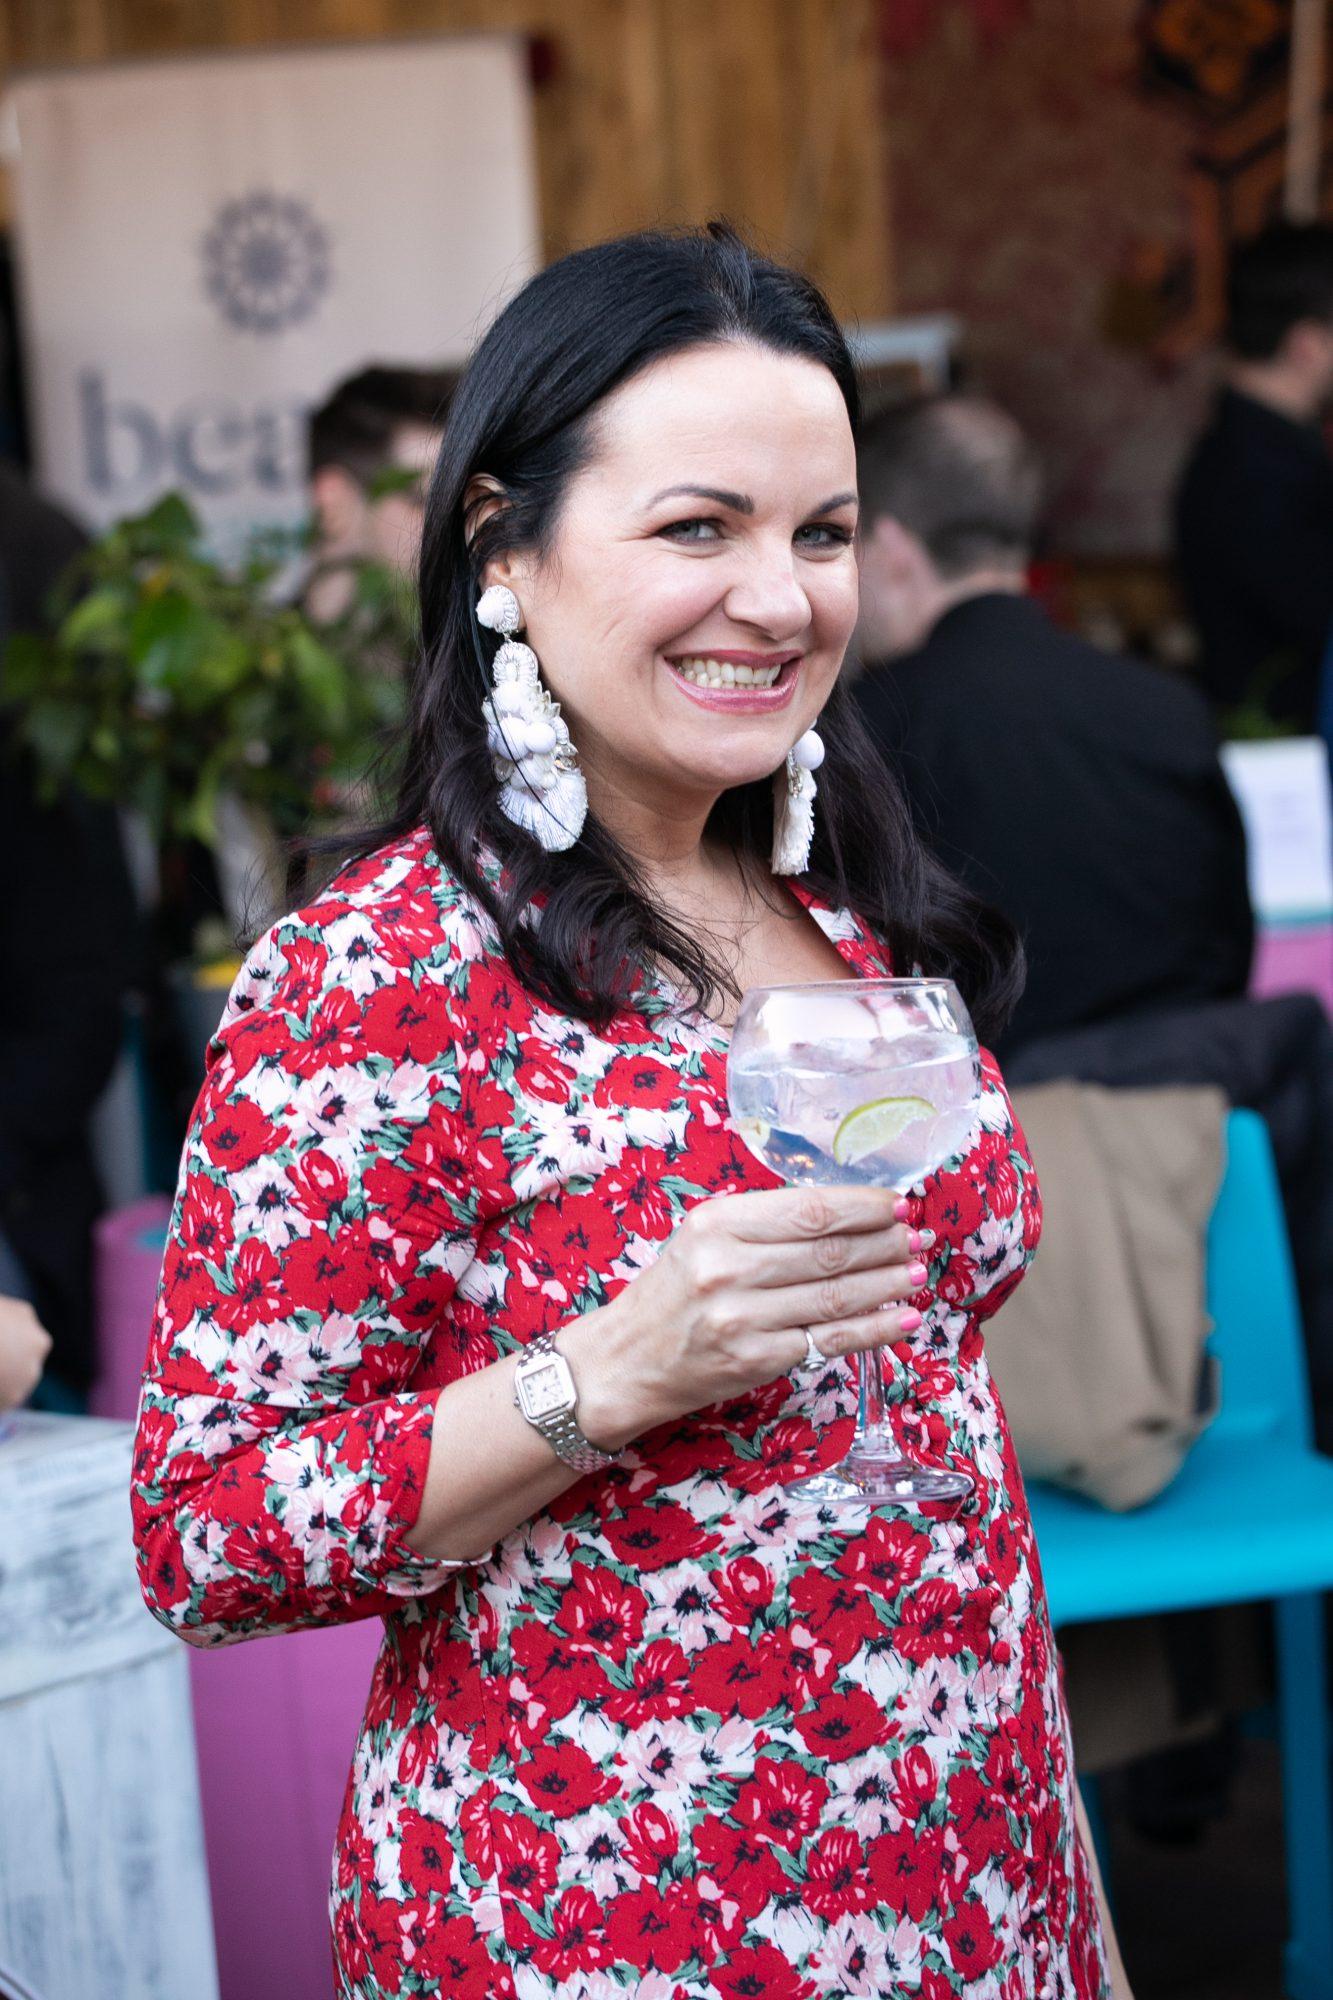 Triona McCarthy at the SuperValu Gin Garden held at Opium Rooftop Garden, Dublin.